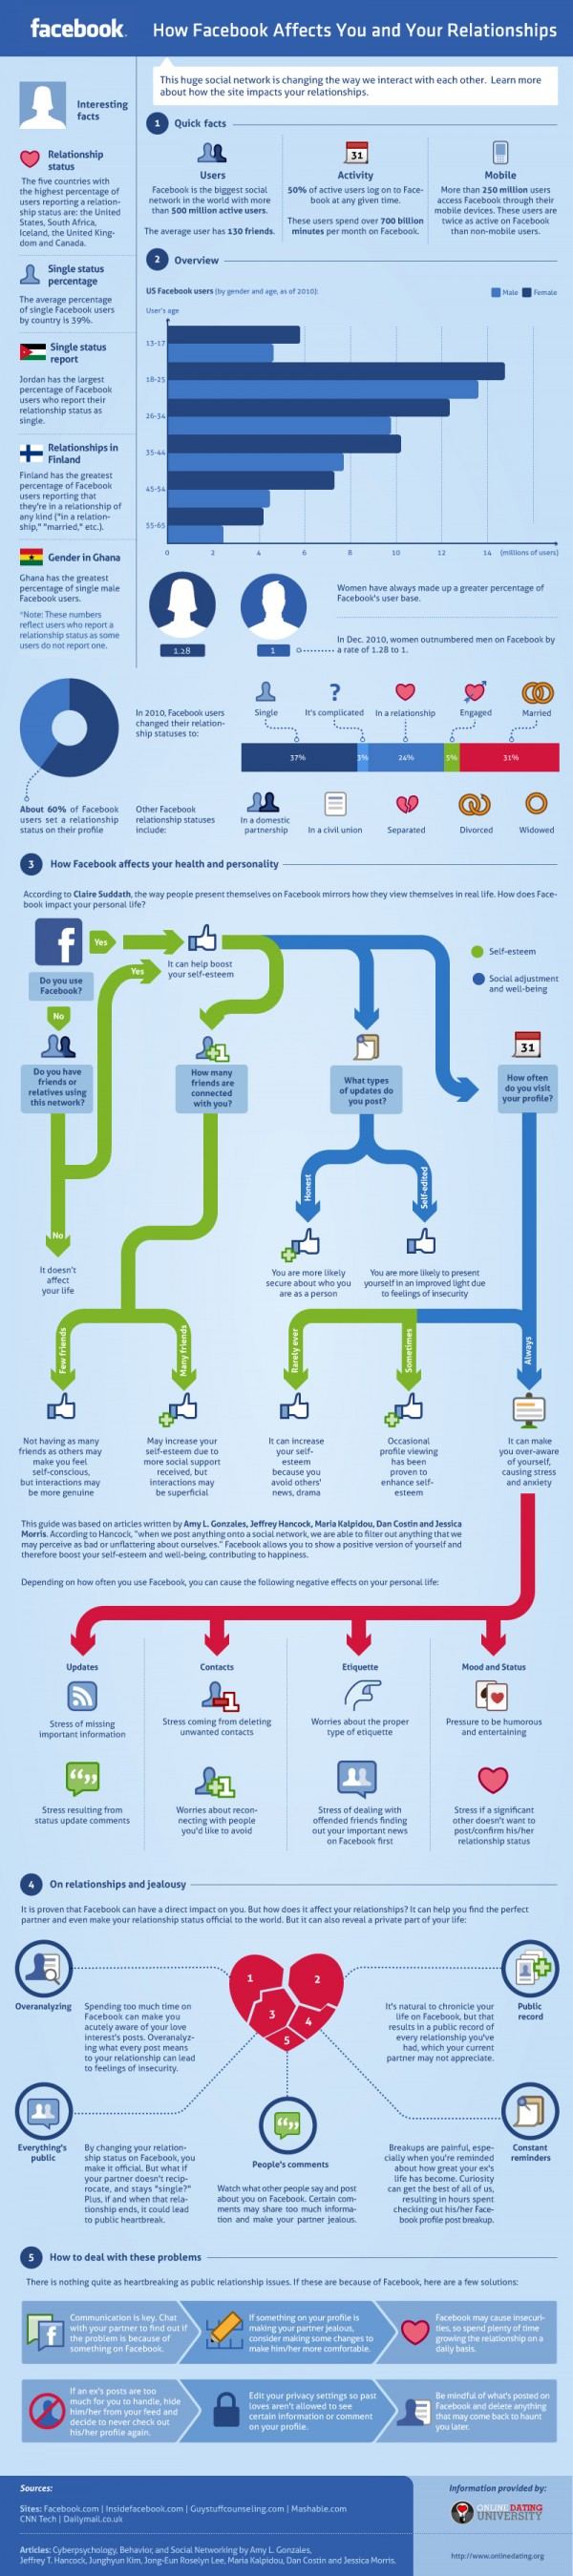 infographic-on-social-media-15